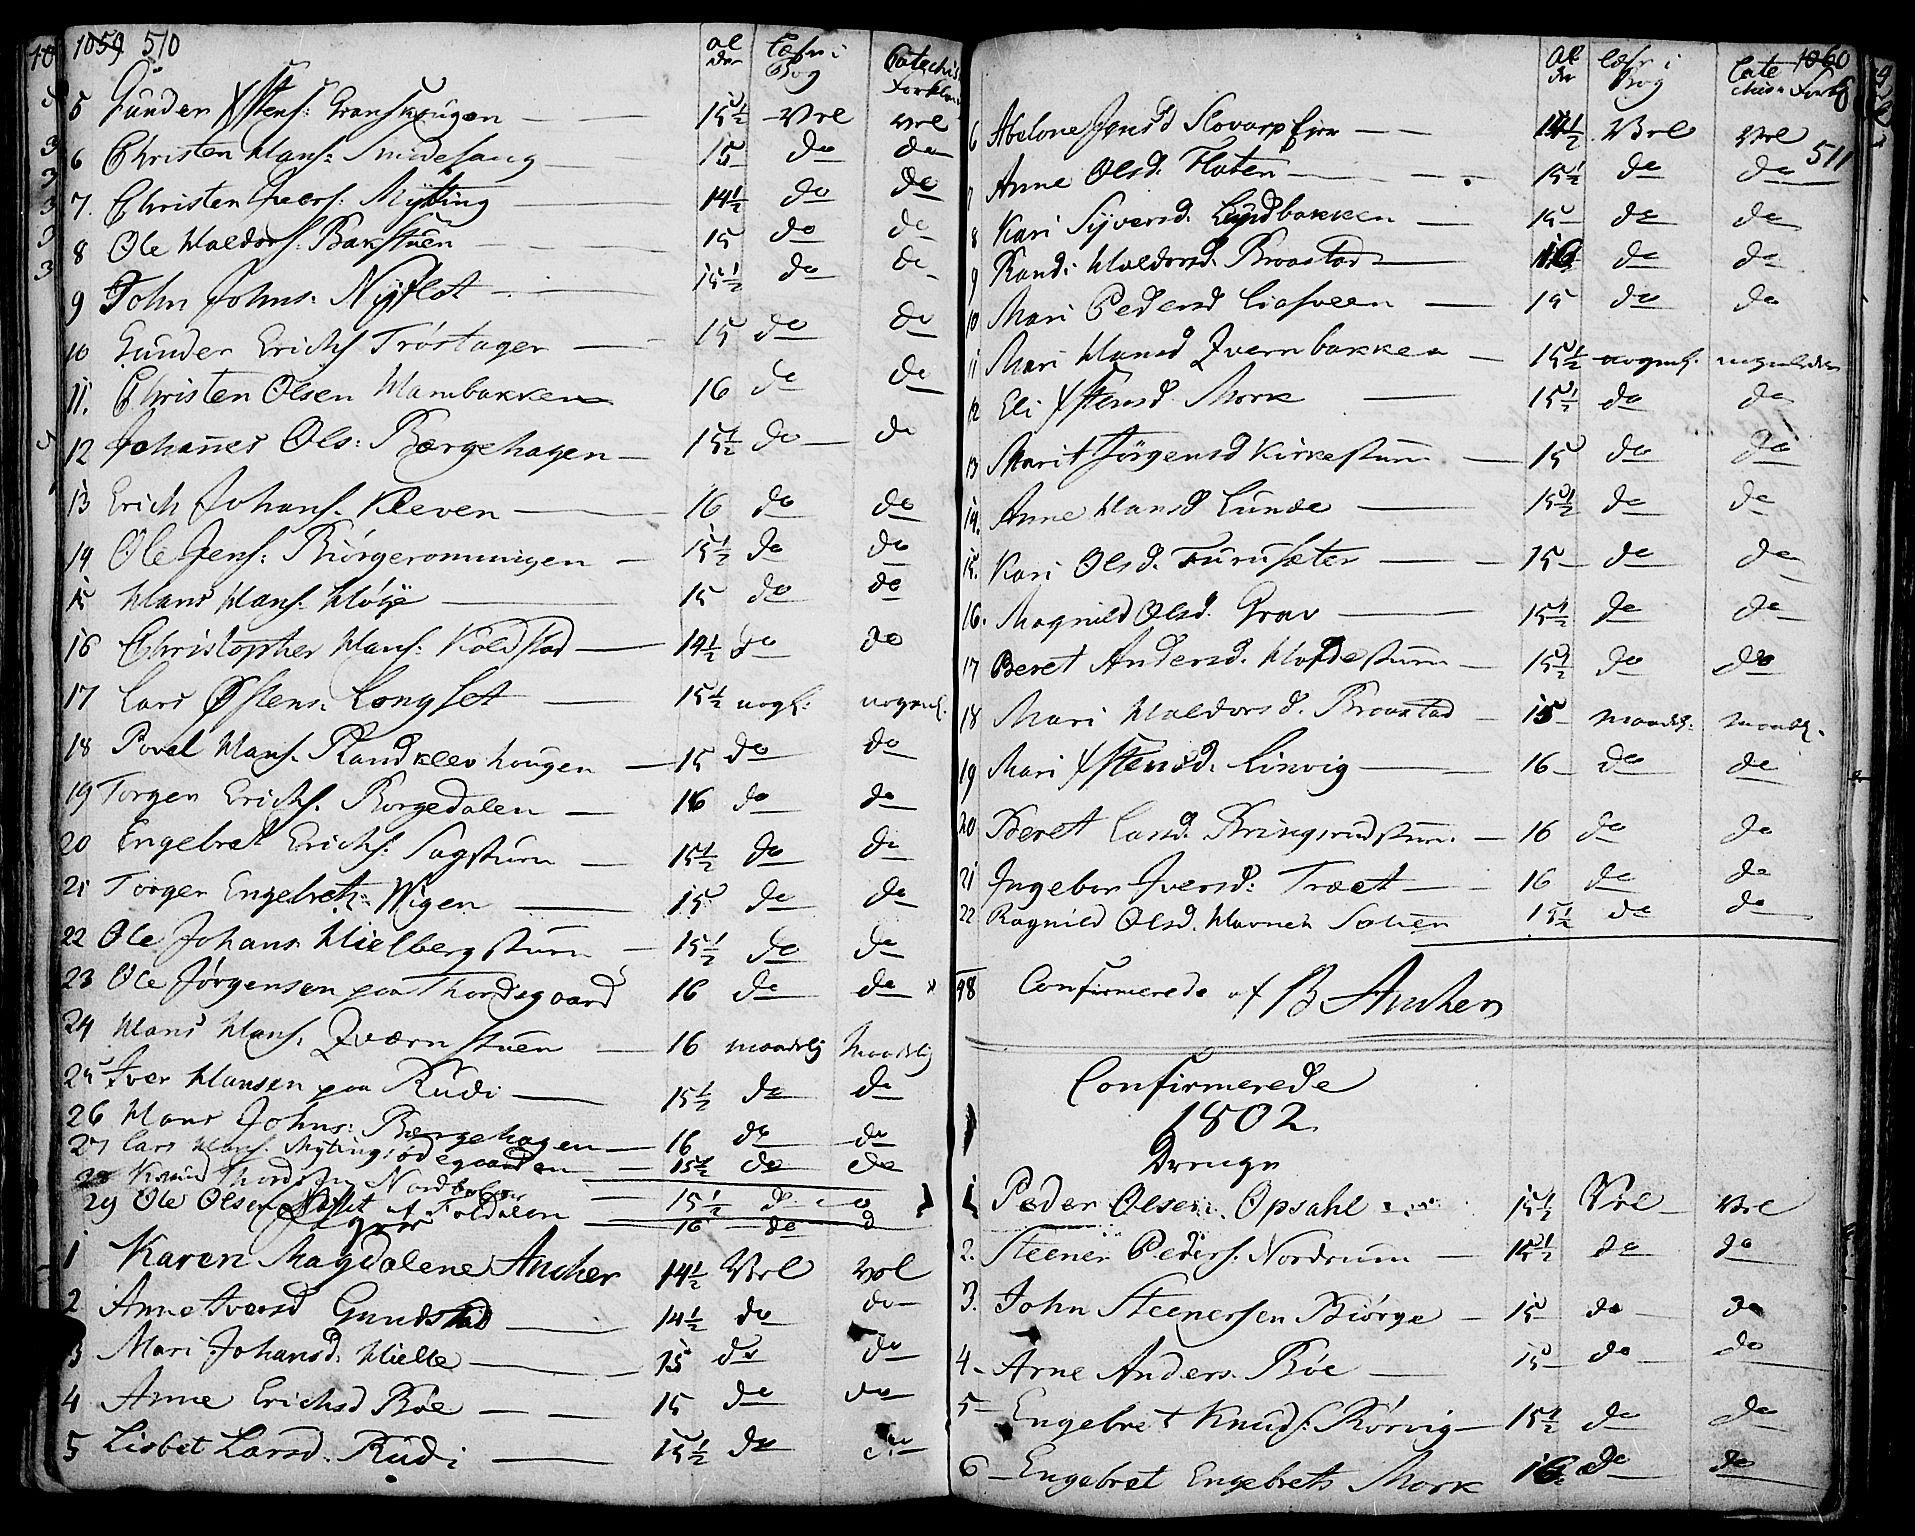 SAH, Ringebu prestekontor, Ministerialbok nr. 3, 1781-1820, s. 510-511